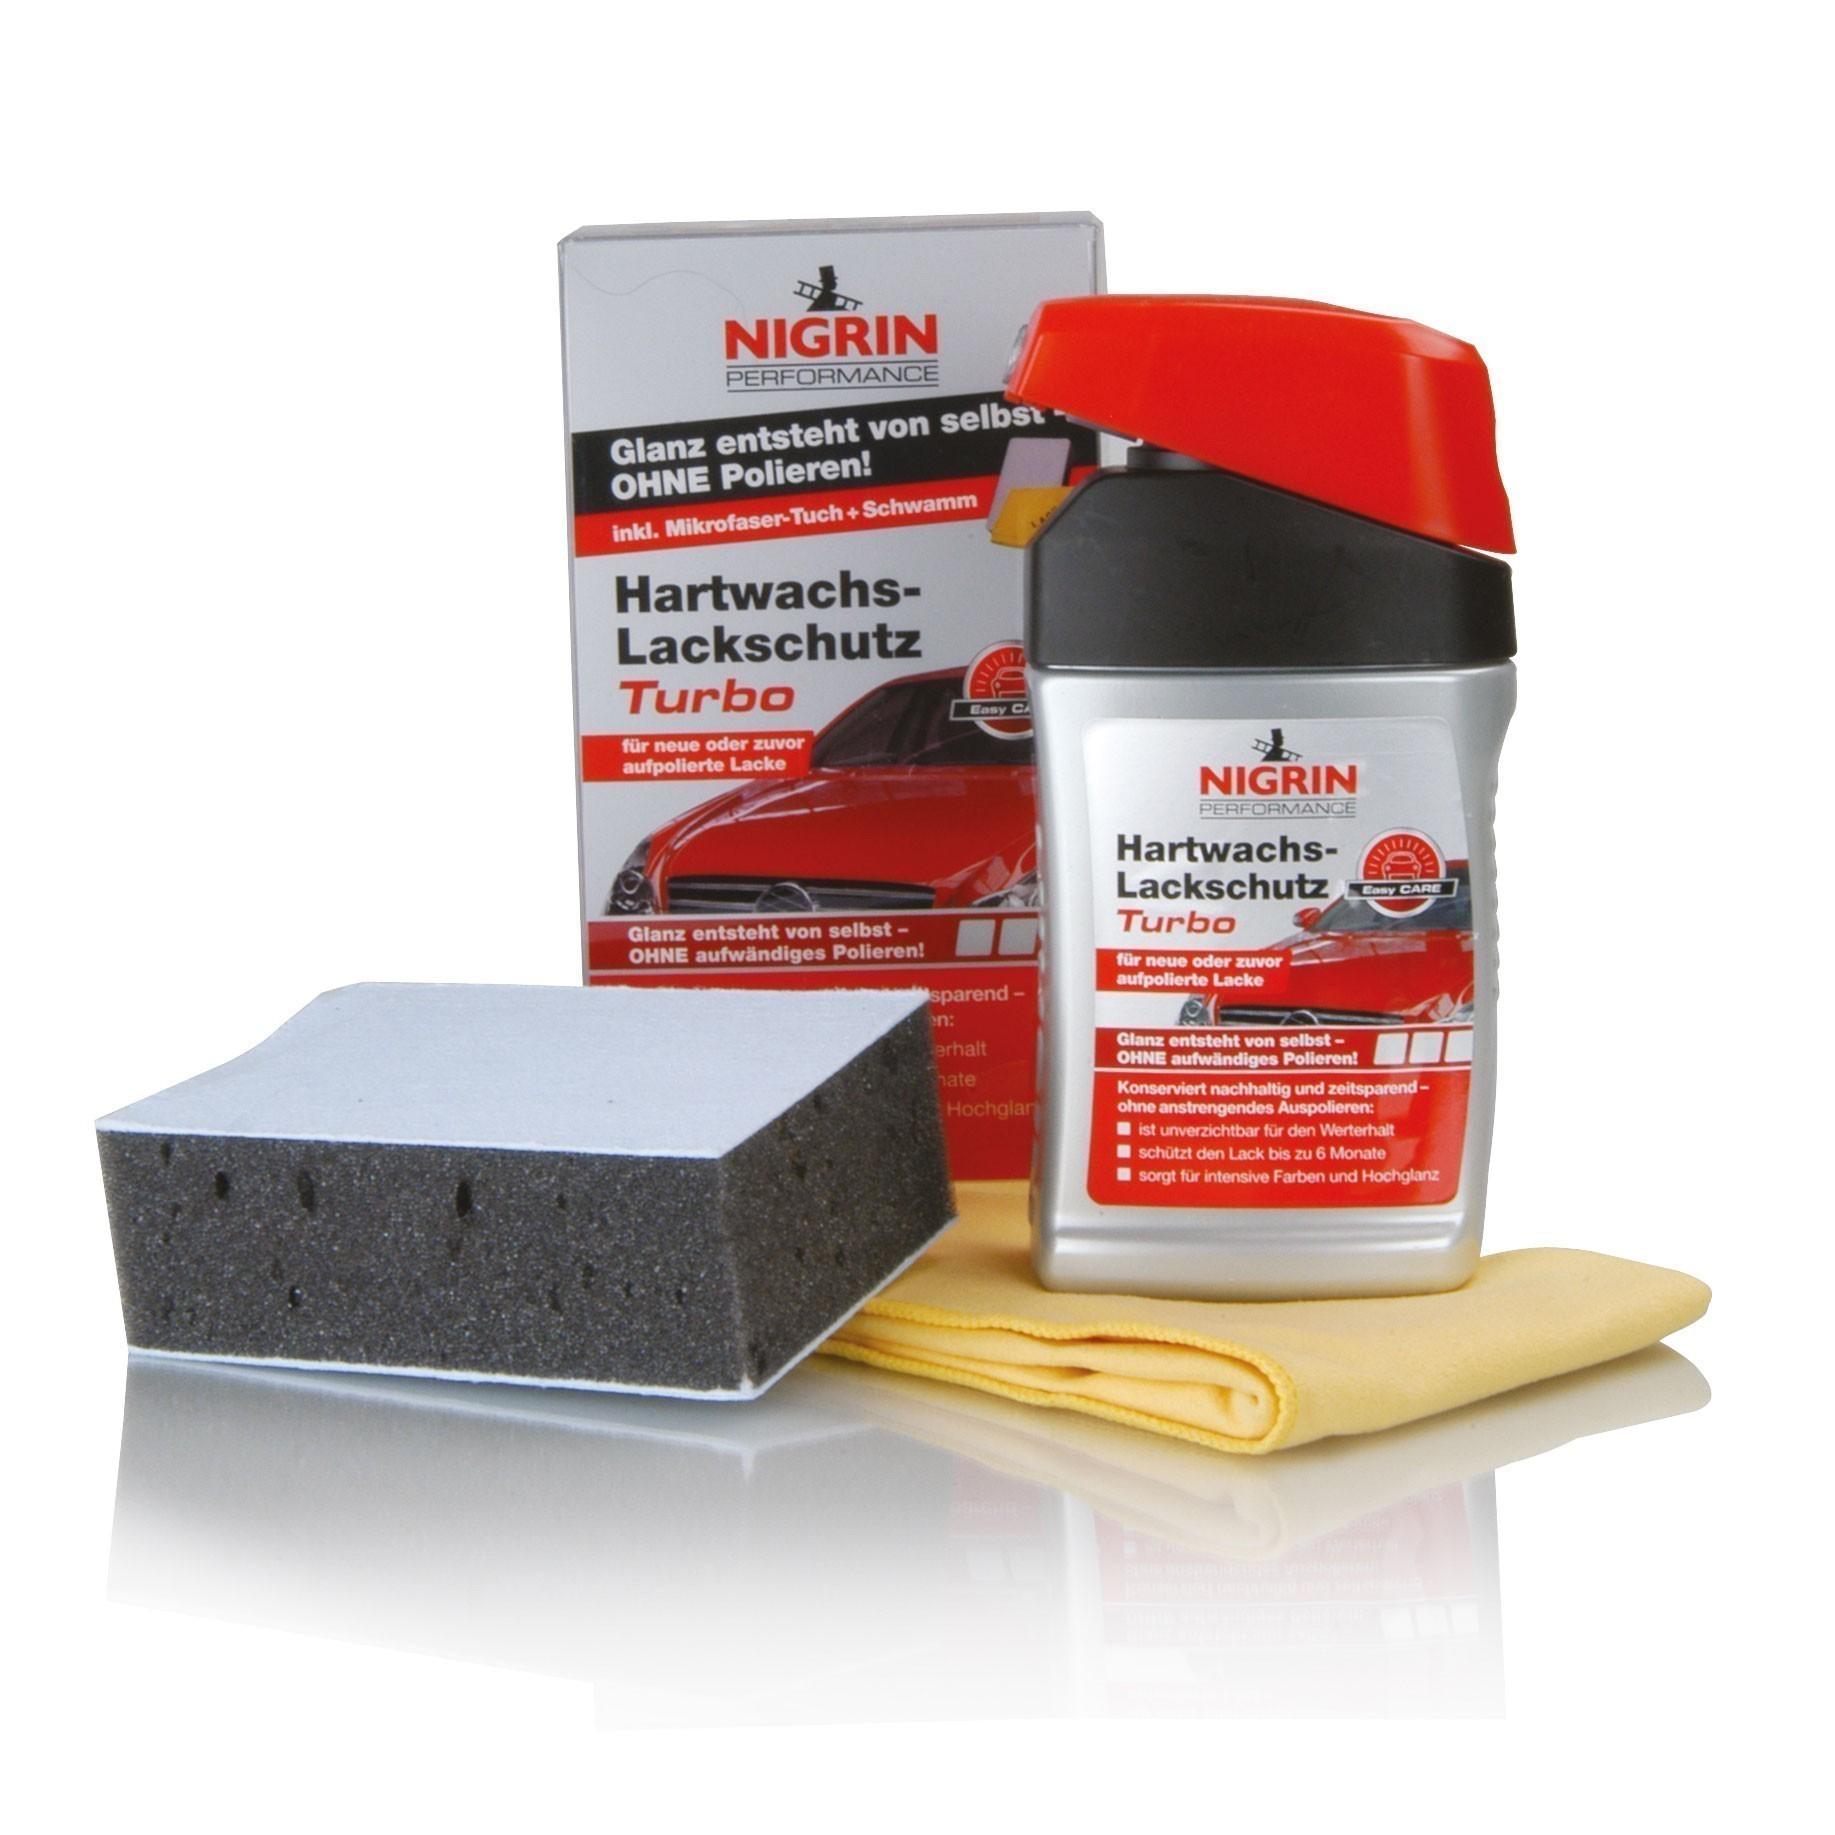 Nigrin Performance Hartwachs-Lackschutz Turbo 300ml Bild 1